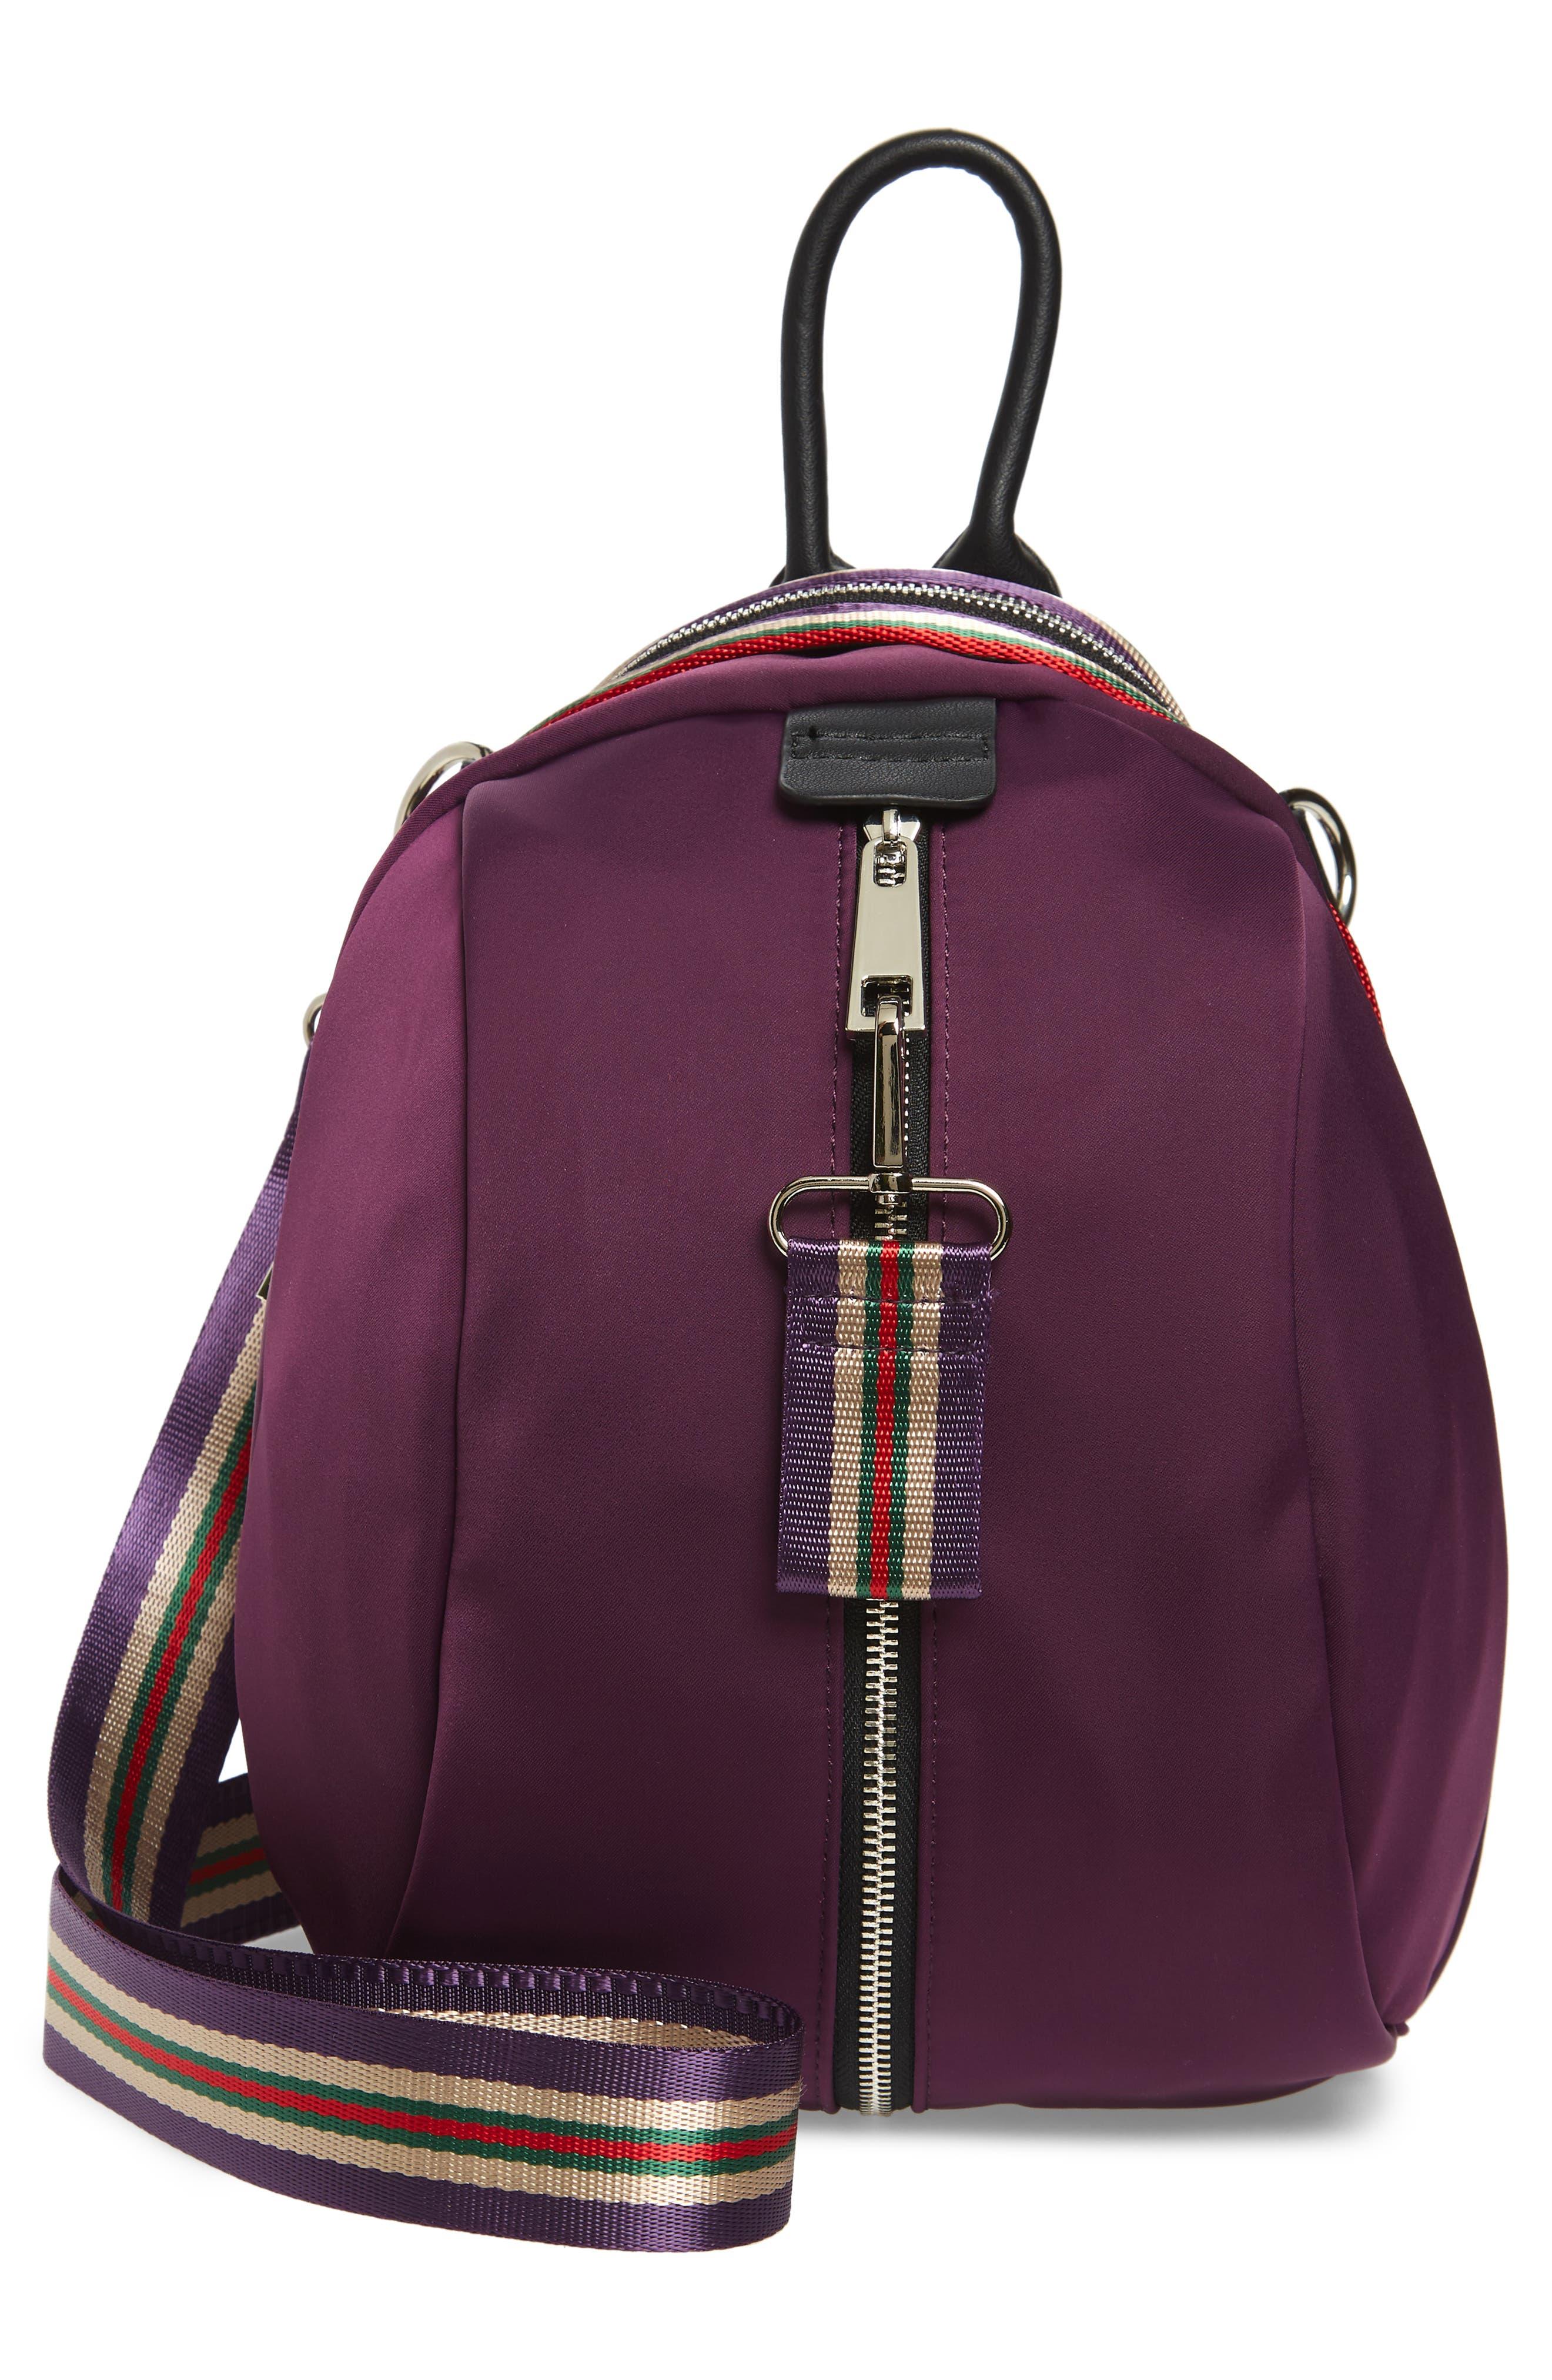 Satin Nylon & Webbing Convertible Backpack,                             Alternate thumbnail 3, color,                             PURPLE